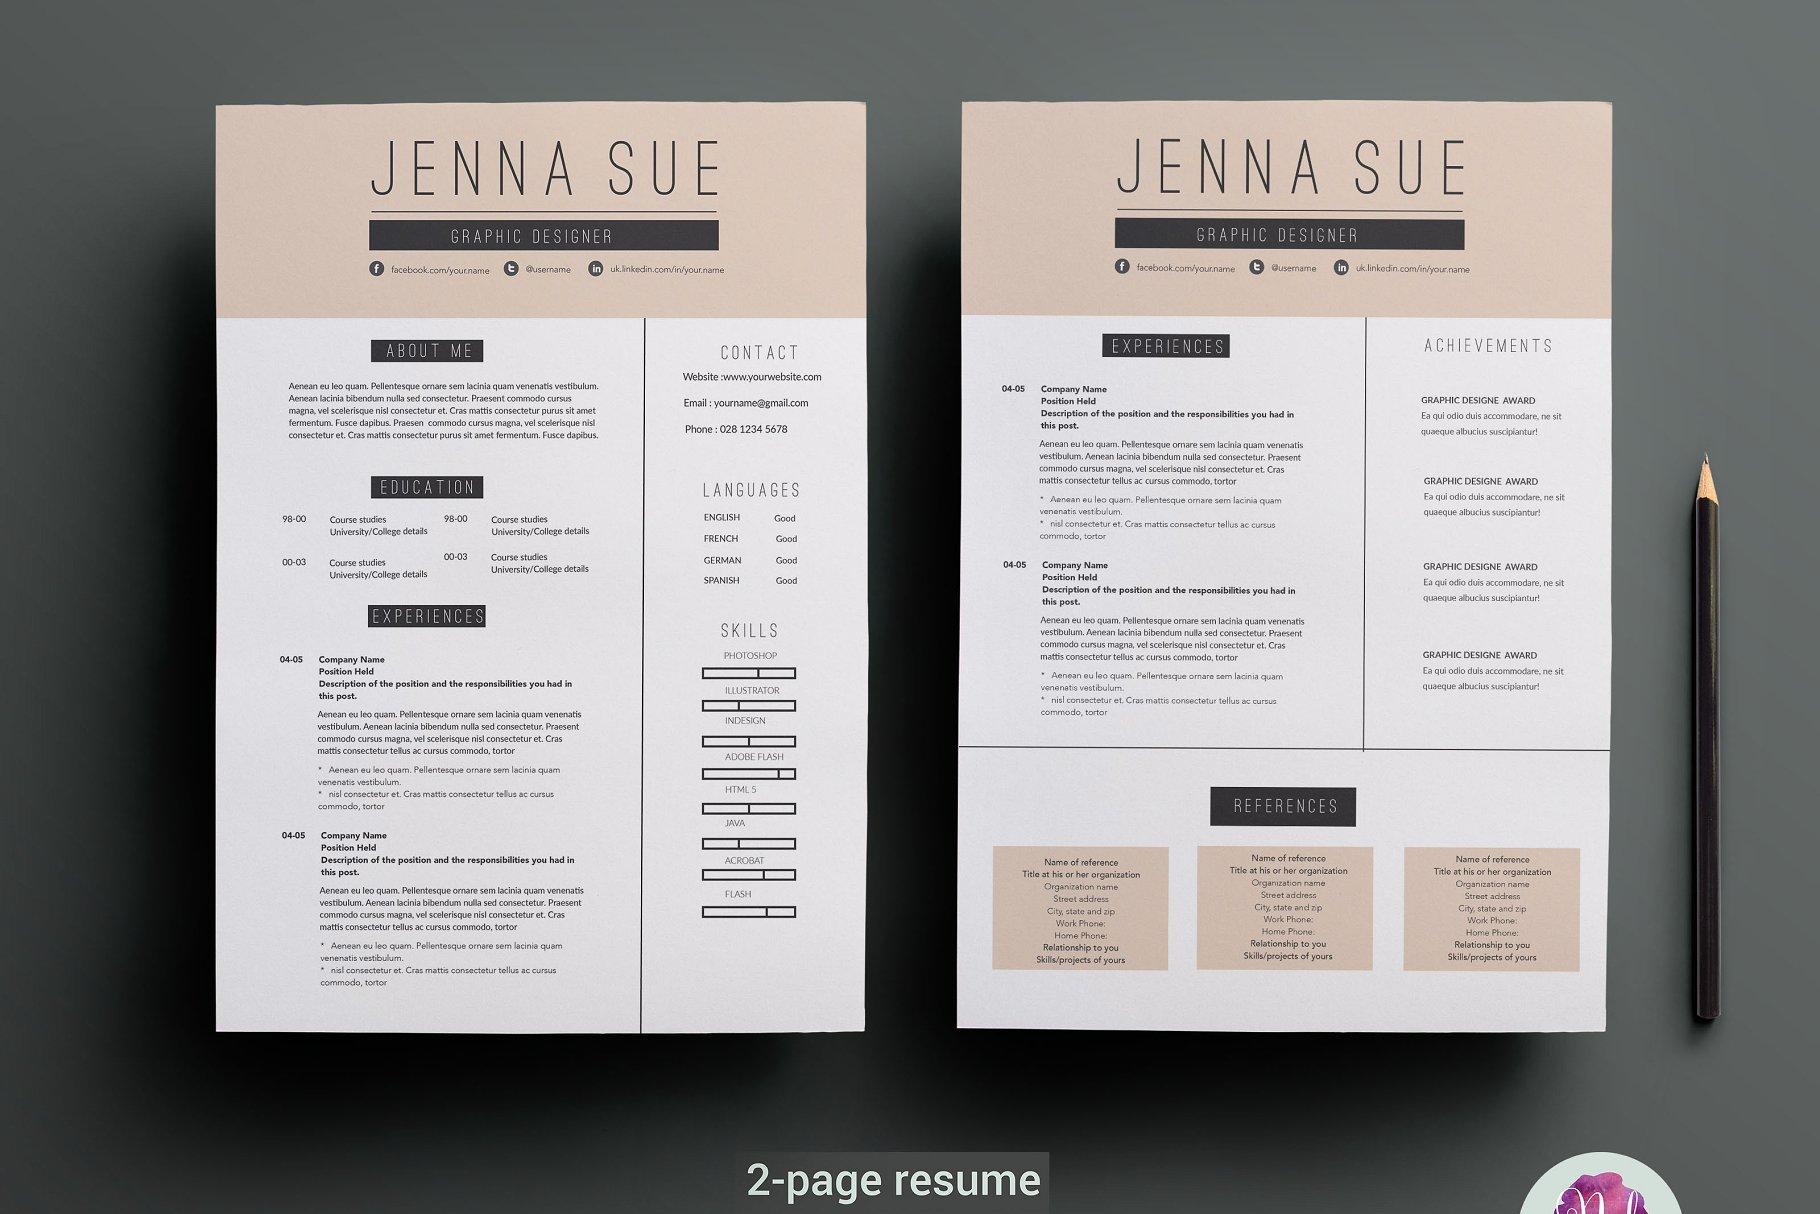 高端精品简历模板展示2-page-resume-template(1)